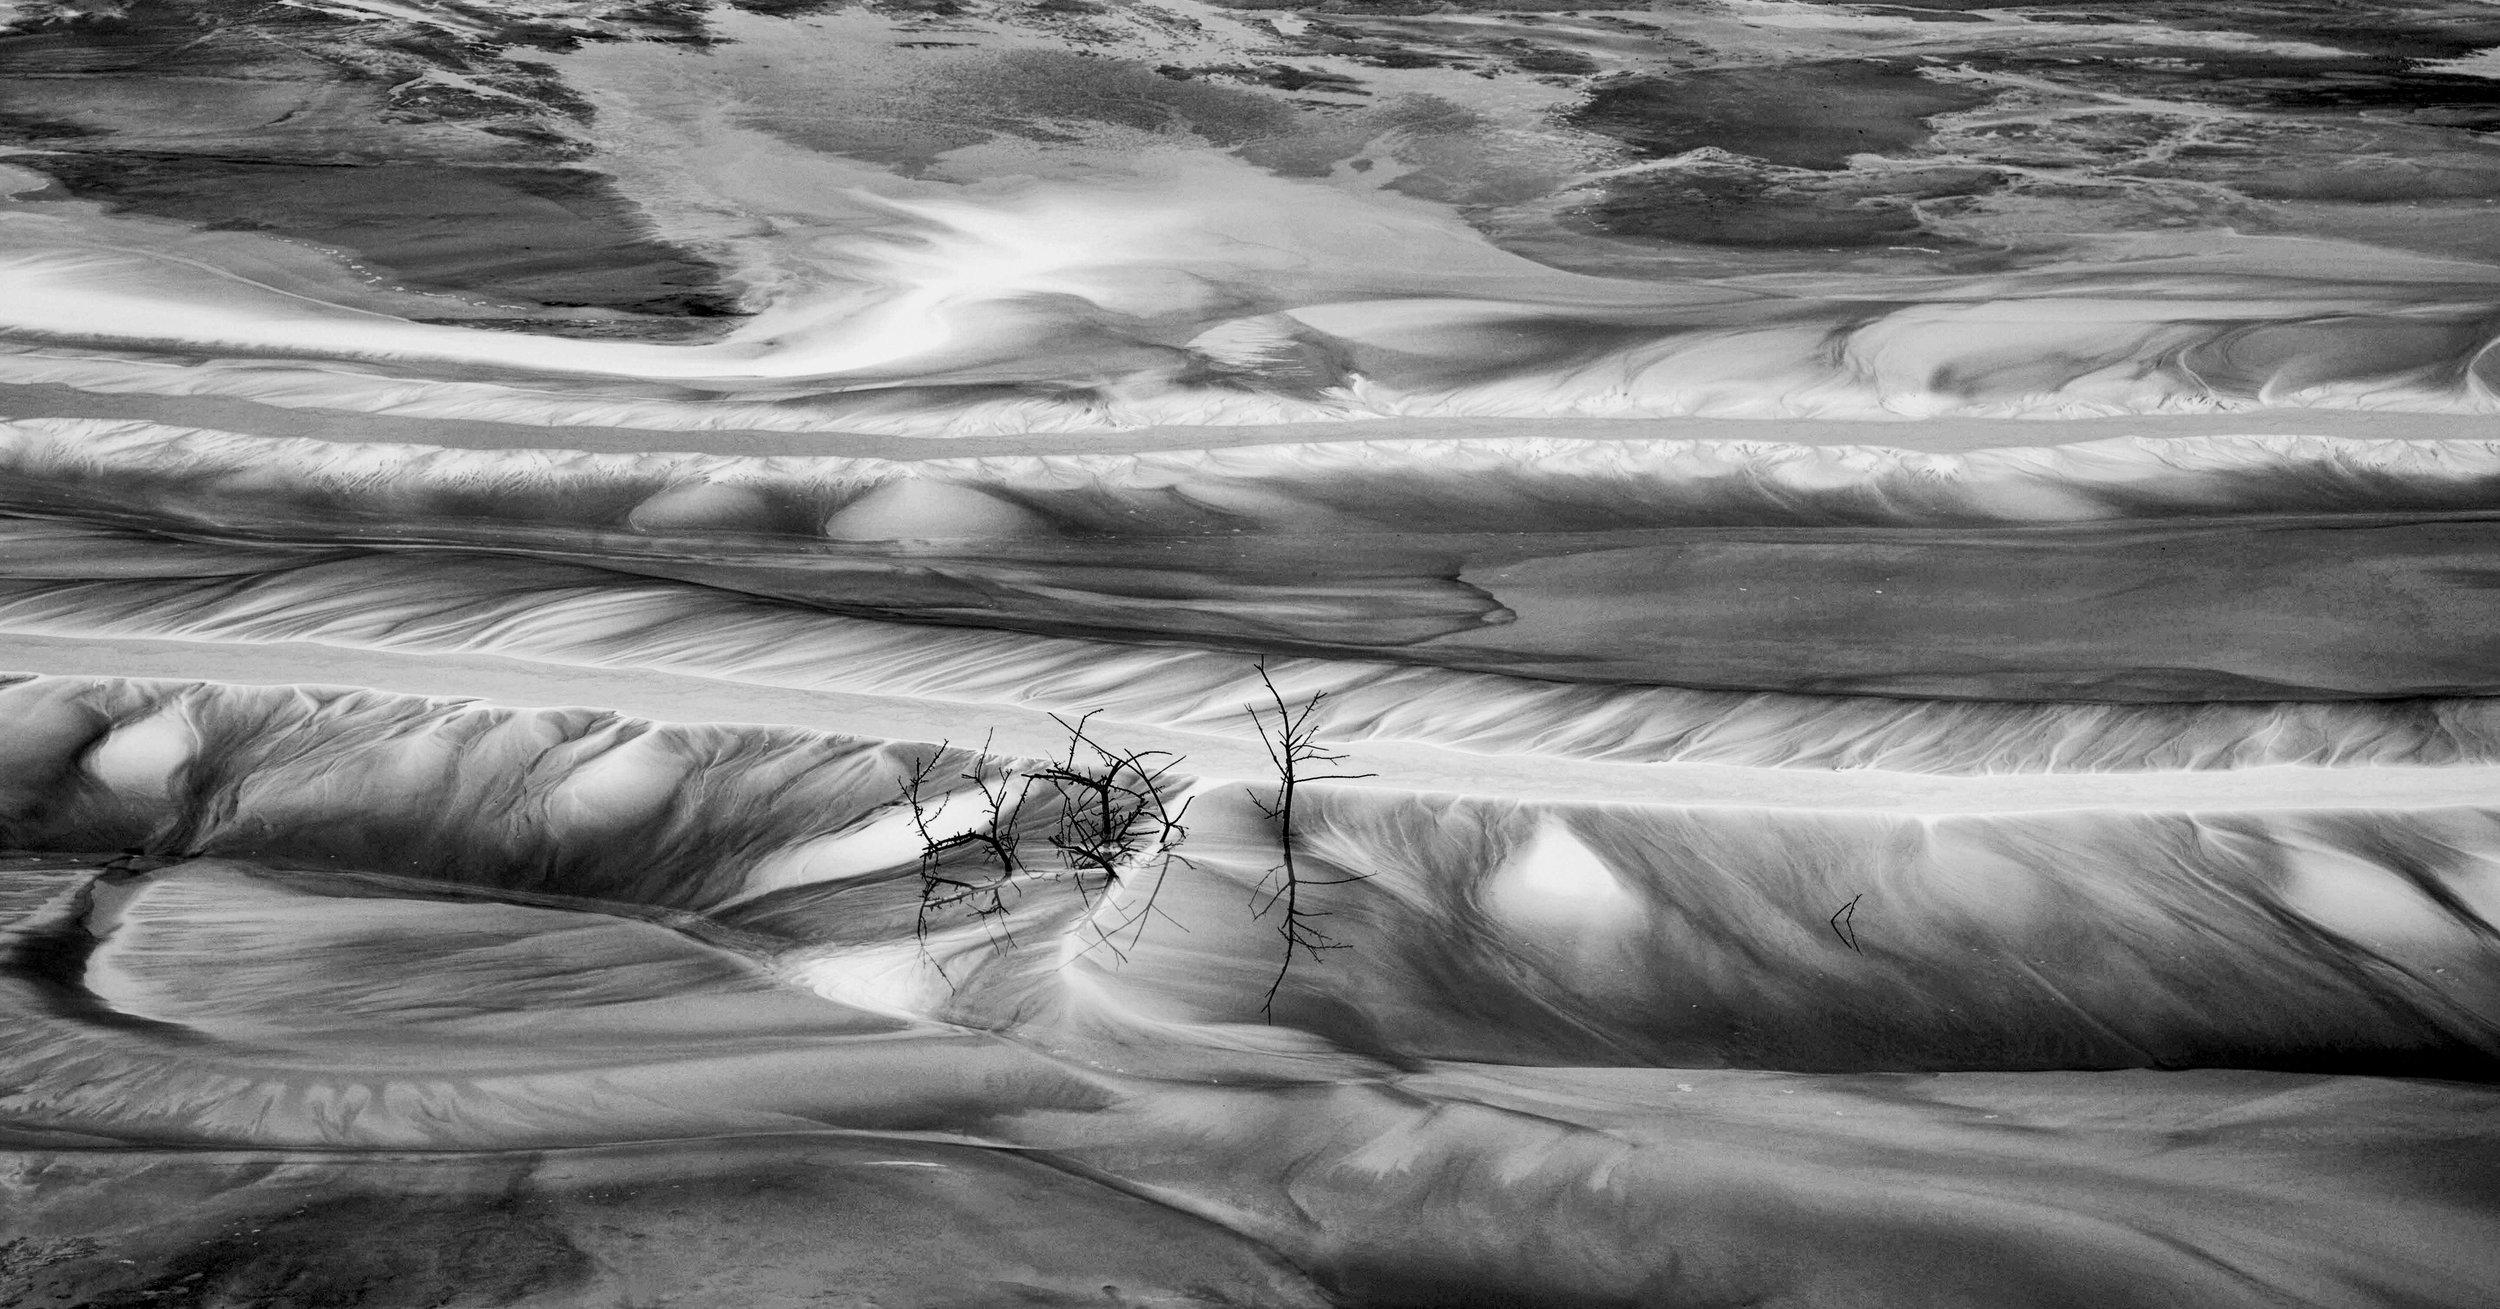 ALD2013-Inthenameofgold10-tailind-pond-1,91x1-ig2.jpg